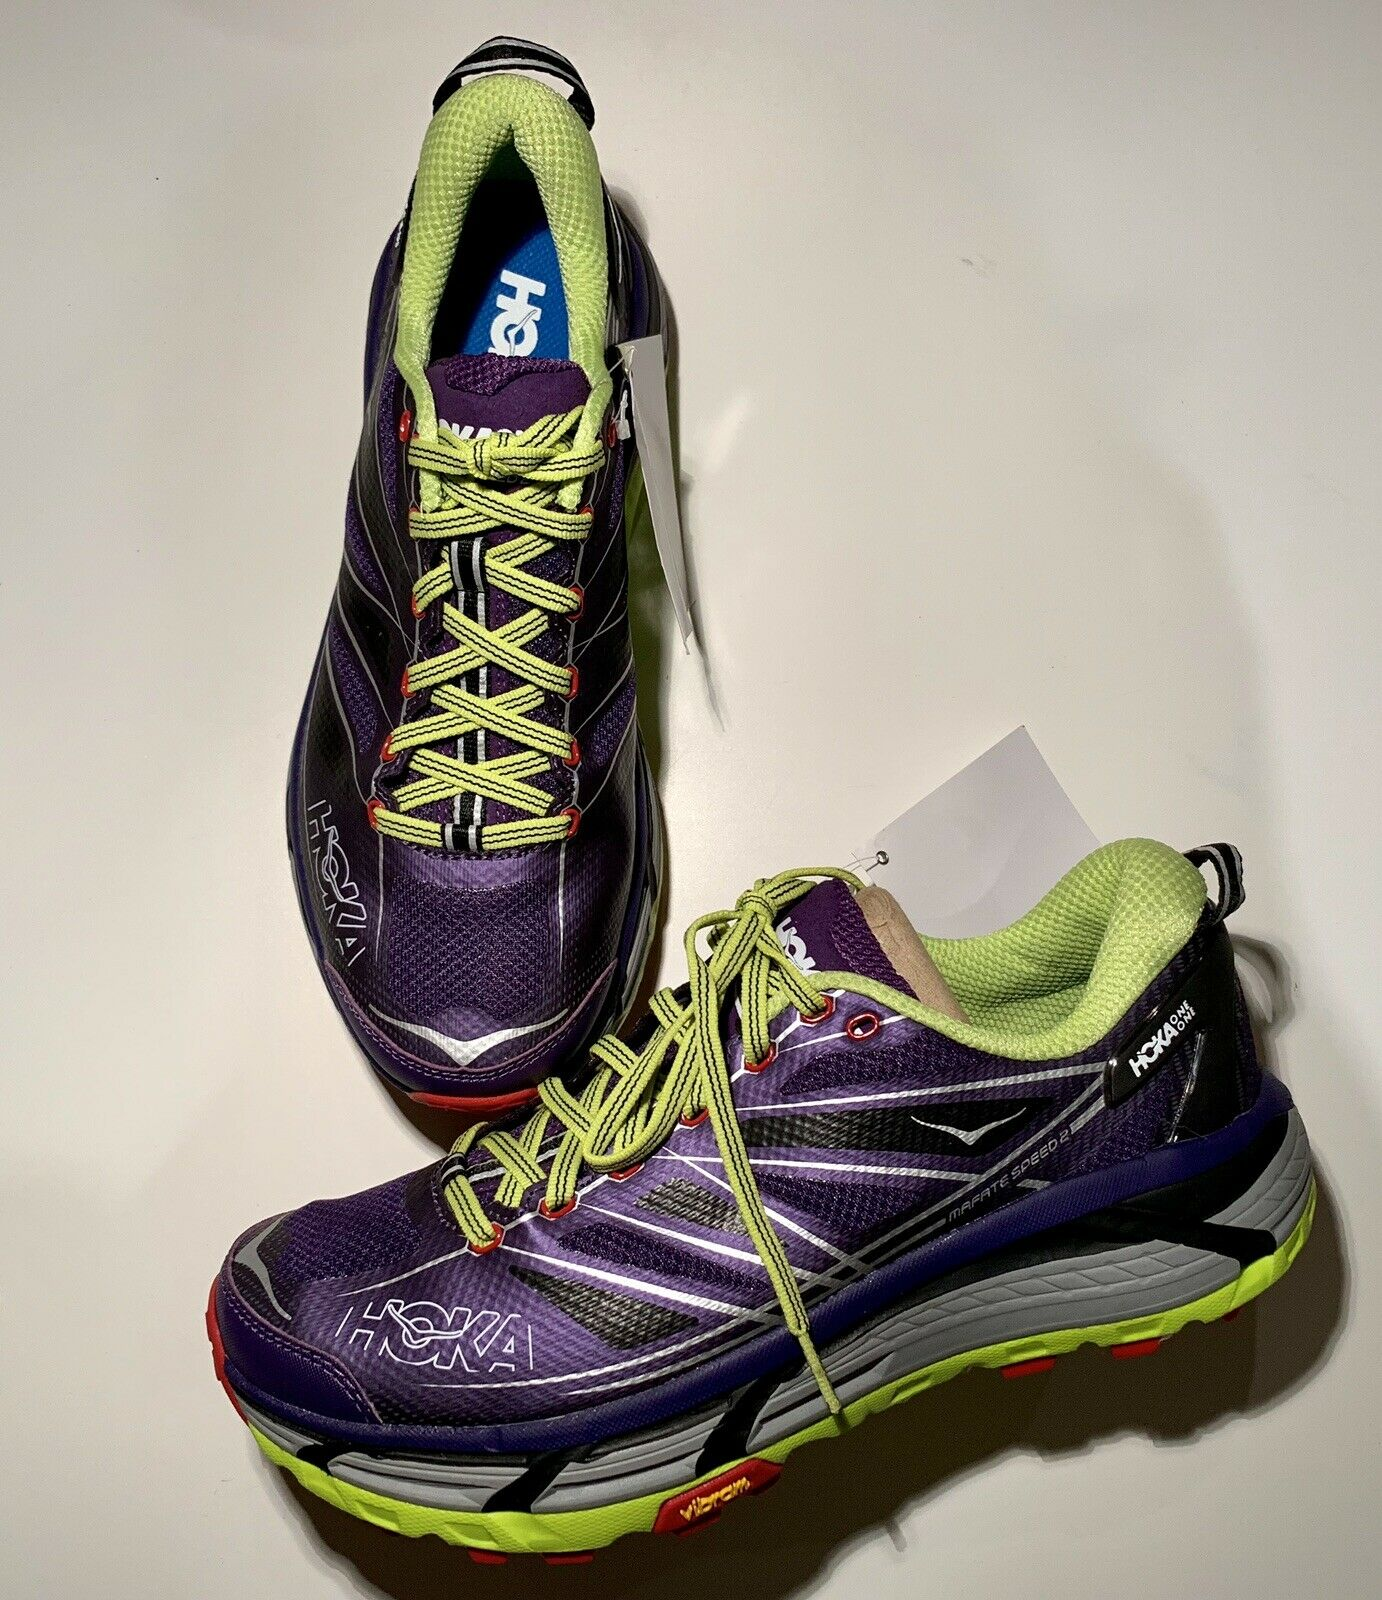 Hoka One One M Mafate Speed Running shoes Mulberry Purple  Acid Size 9 NWOB B1